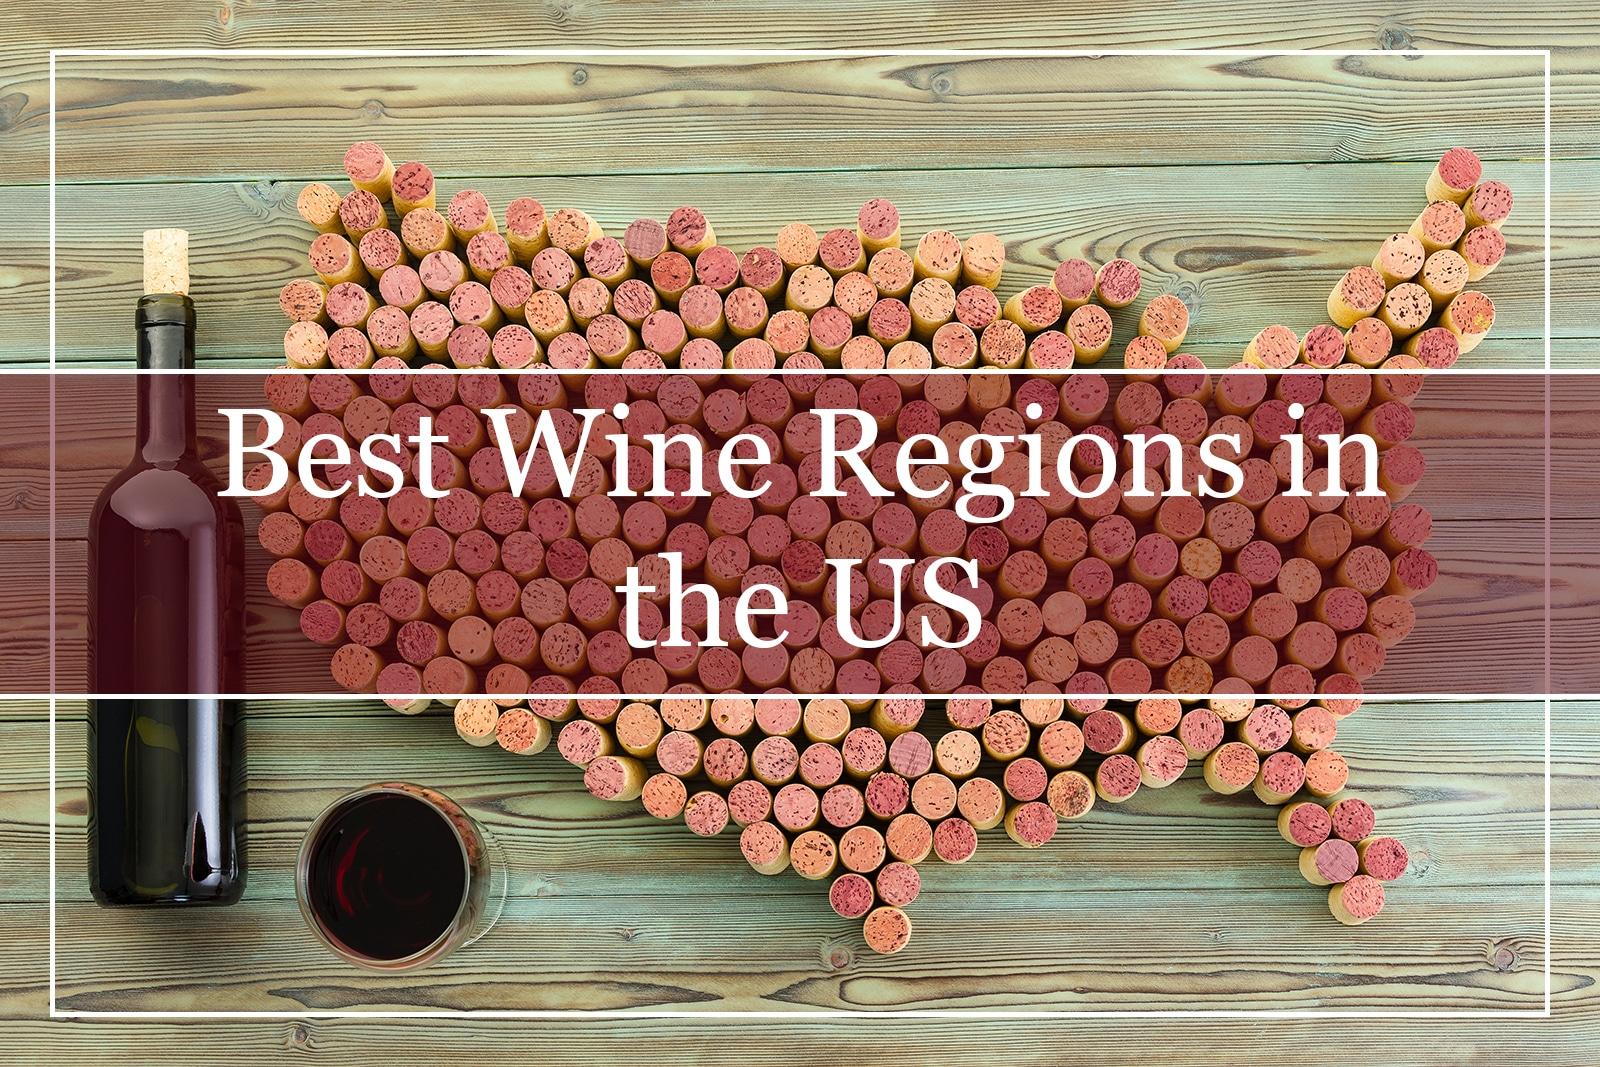 Best Wine Regions in the US